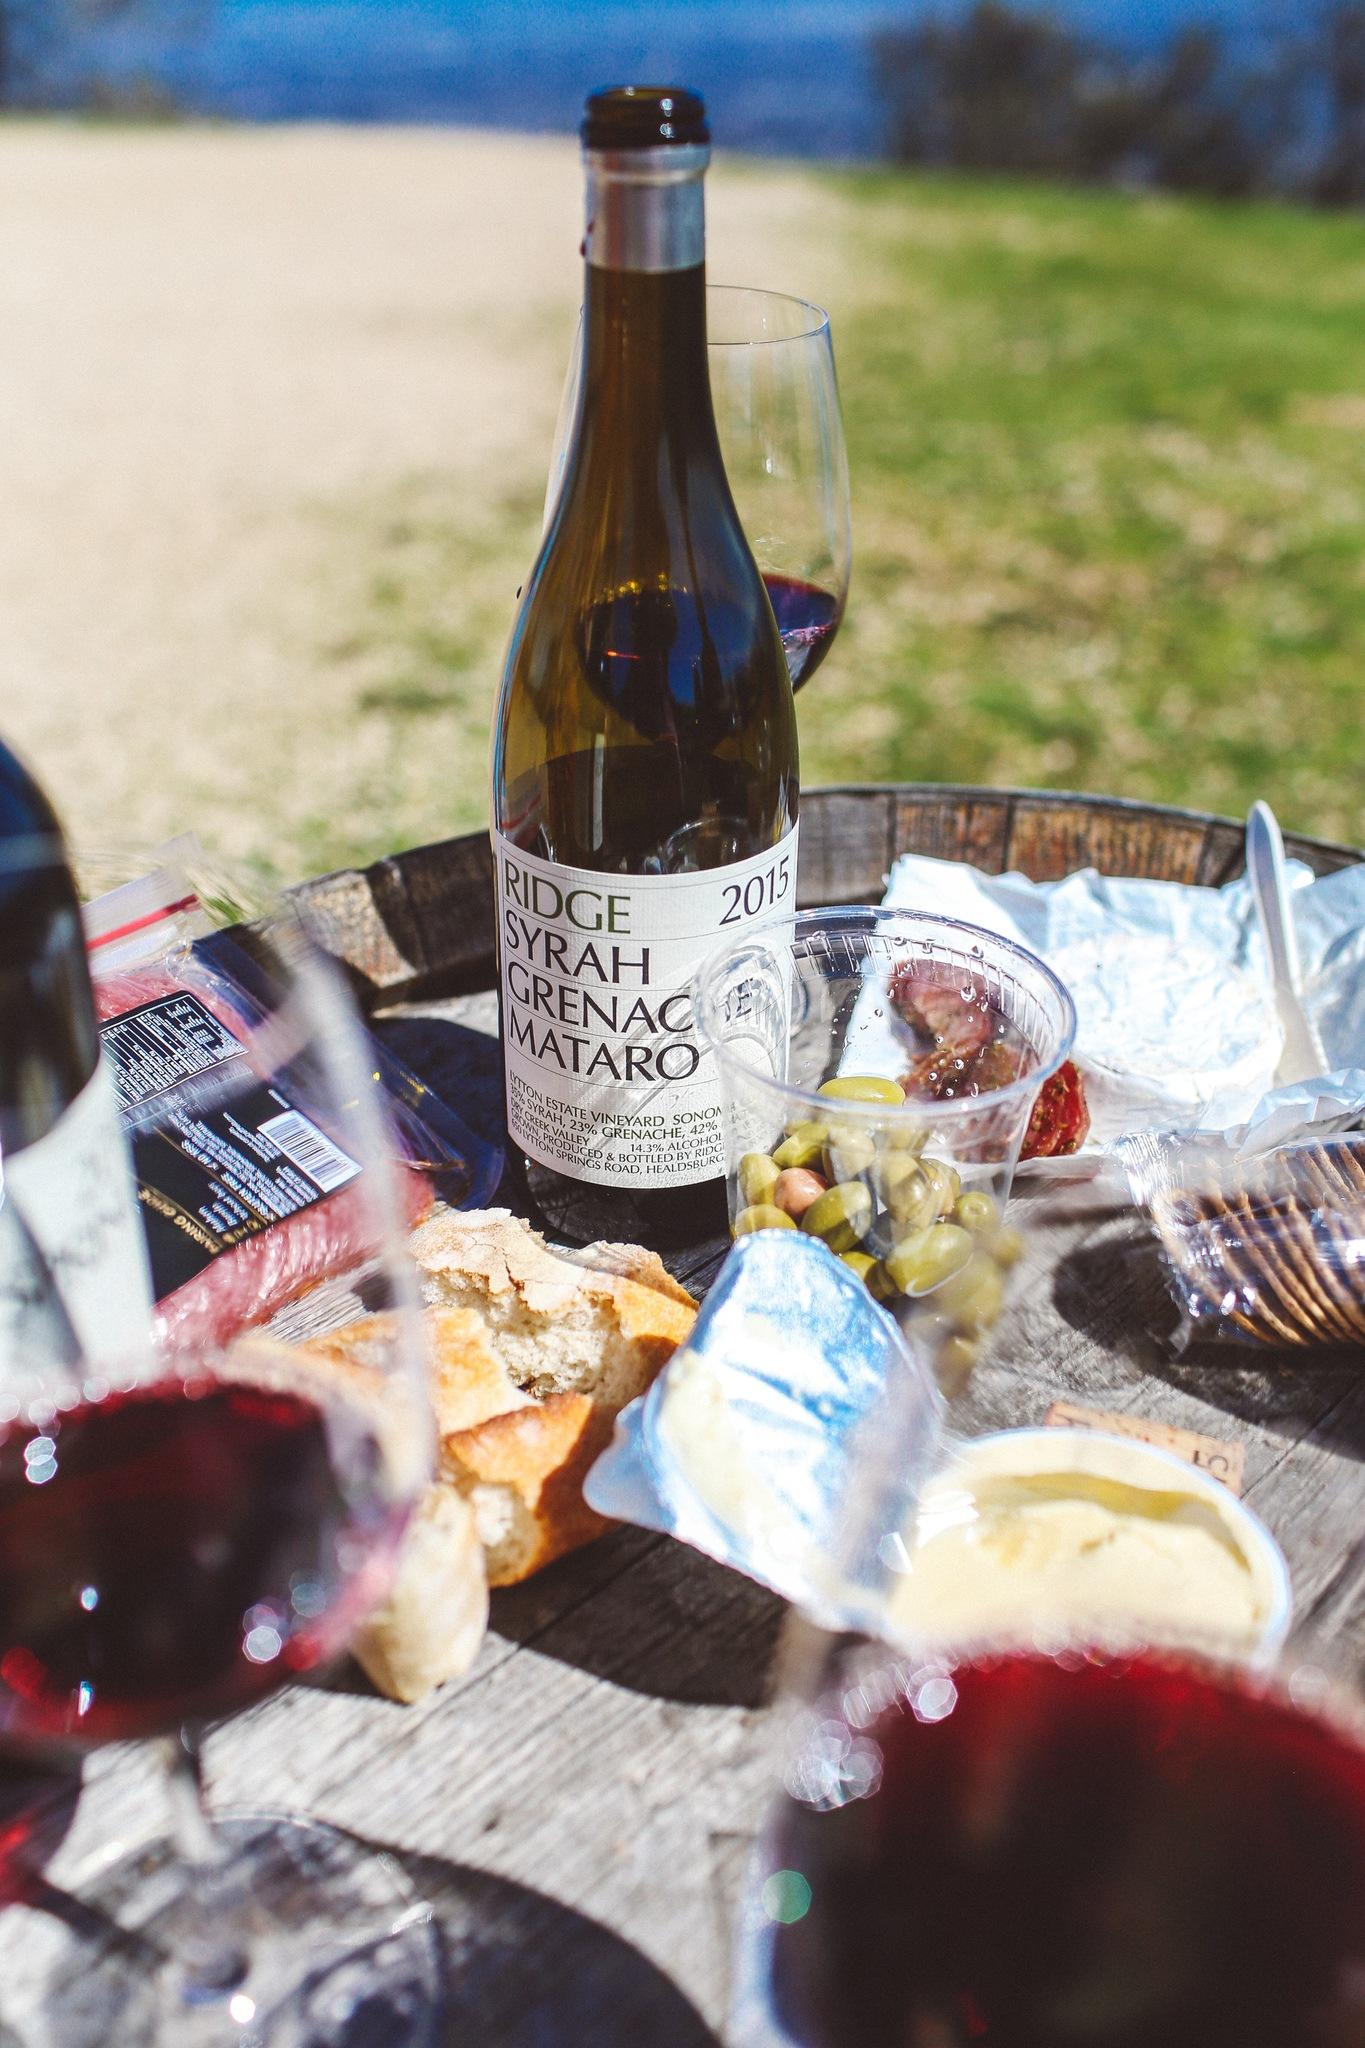 Wine and food at Ridge Winery in the Santa Cruz mountains